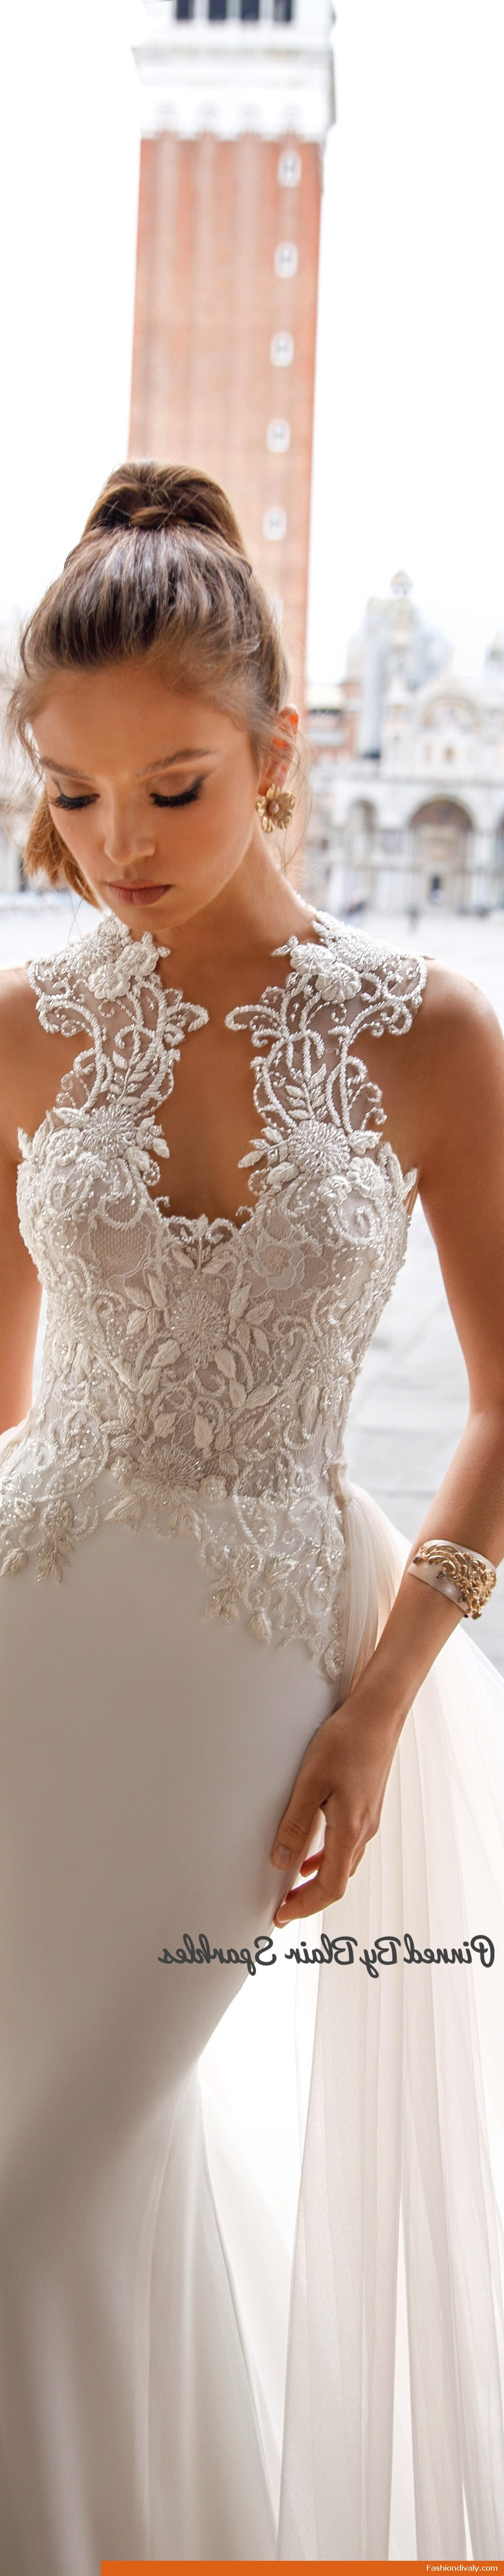 Charming wedding dresses love my wedding dress style see more